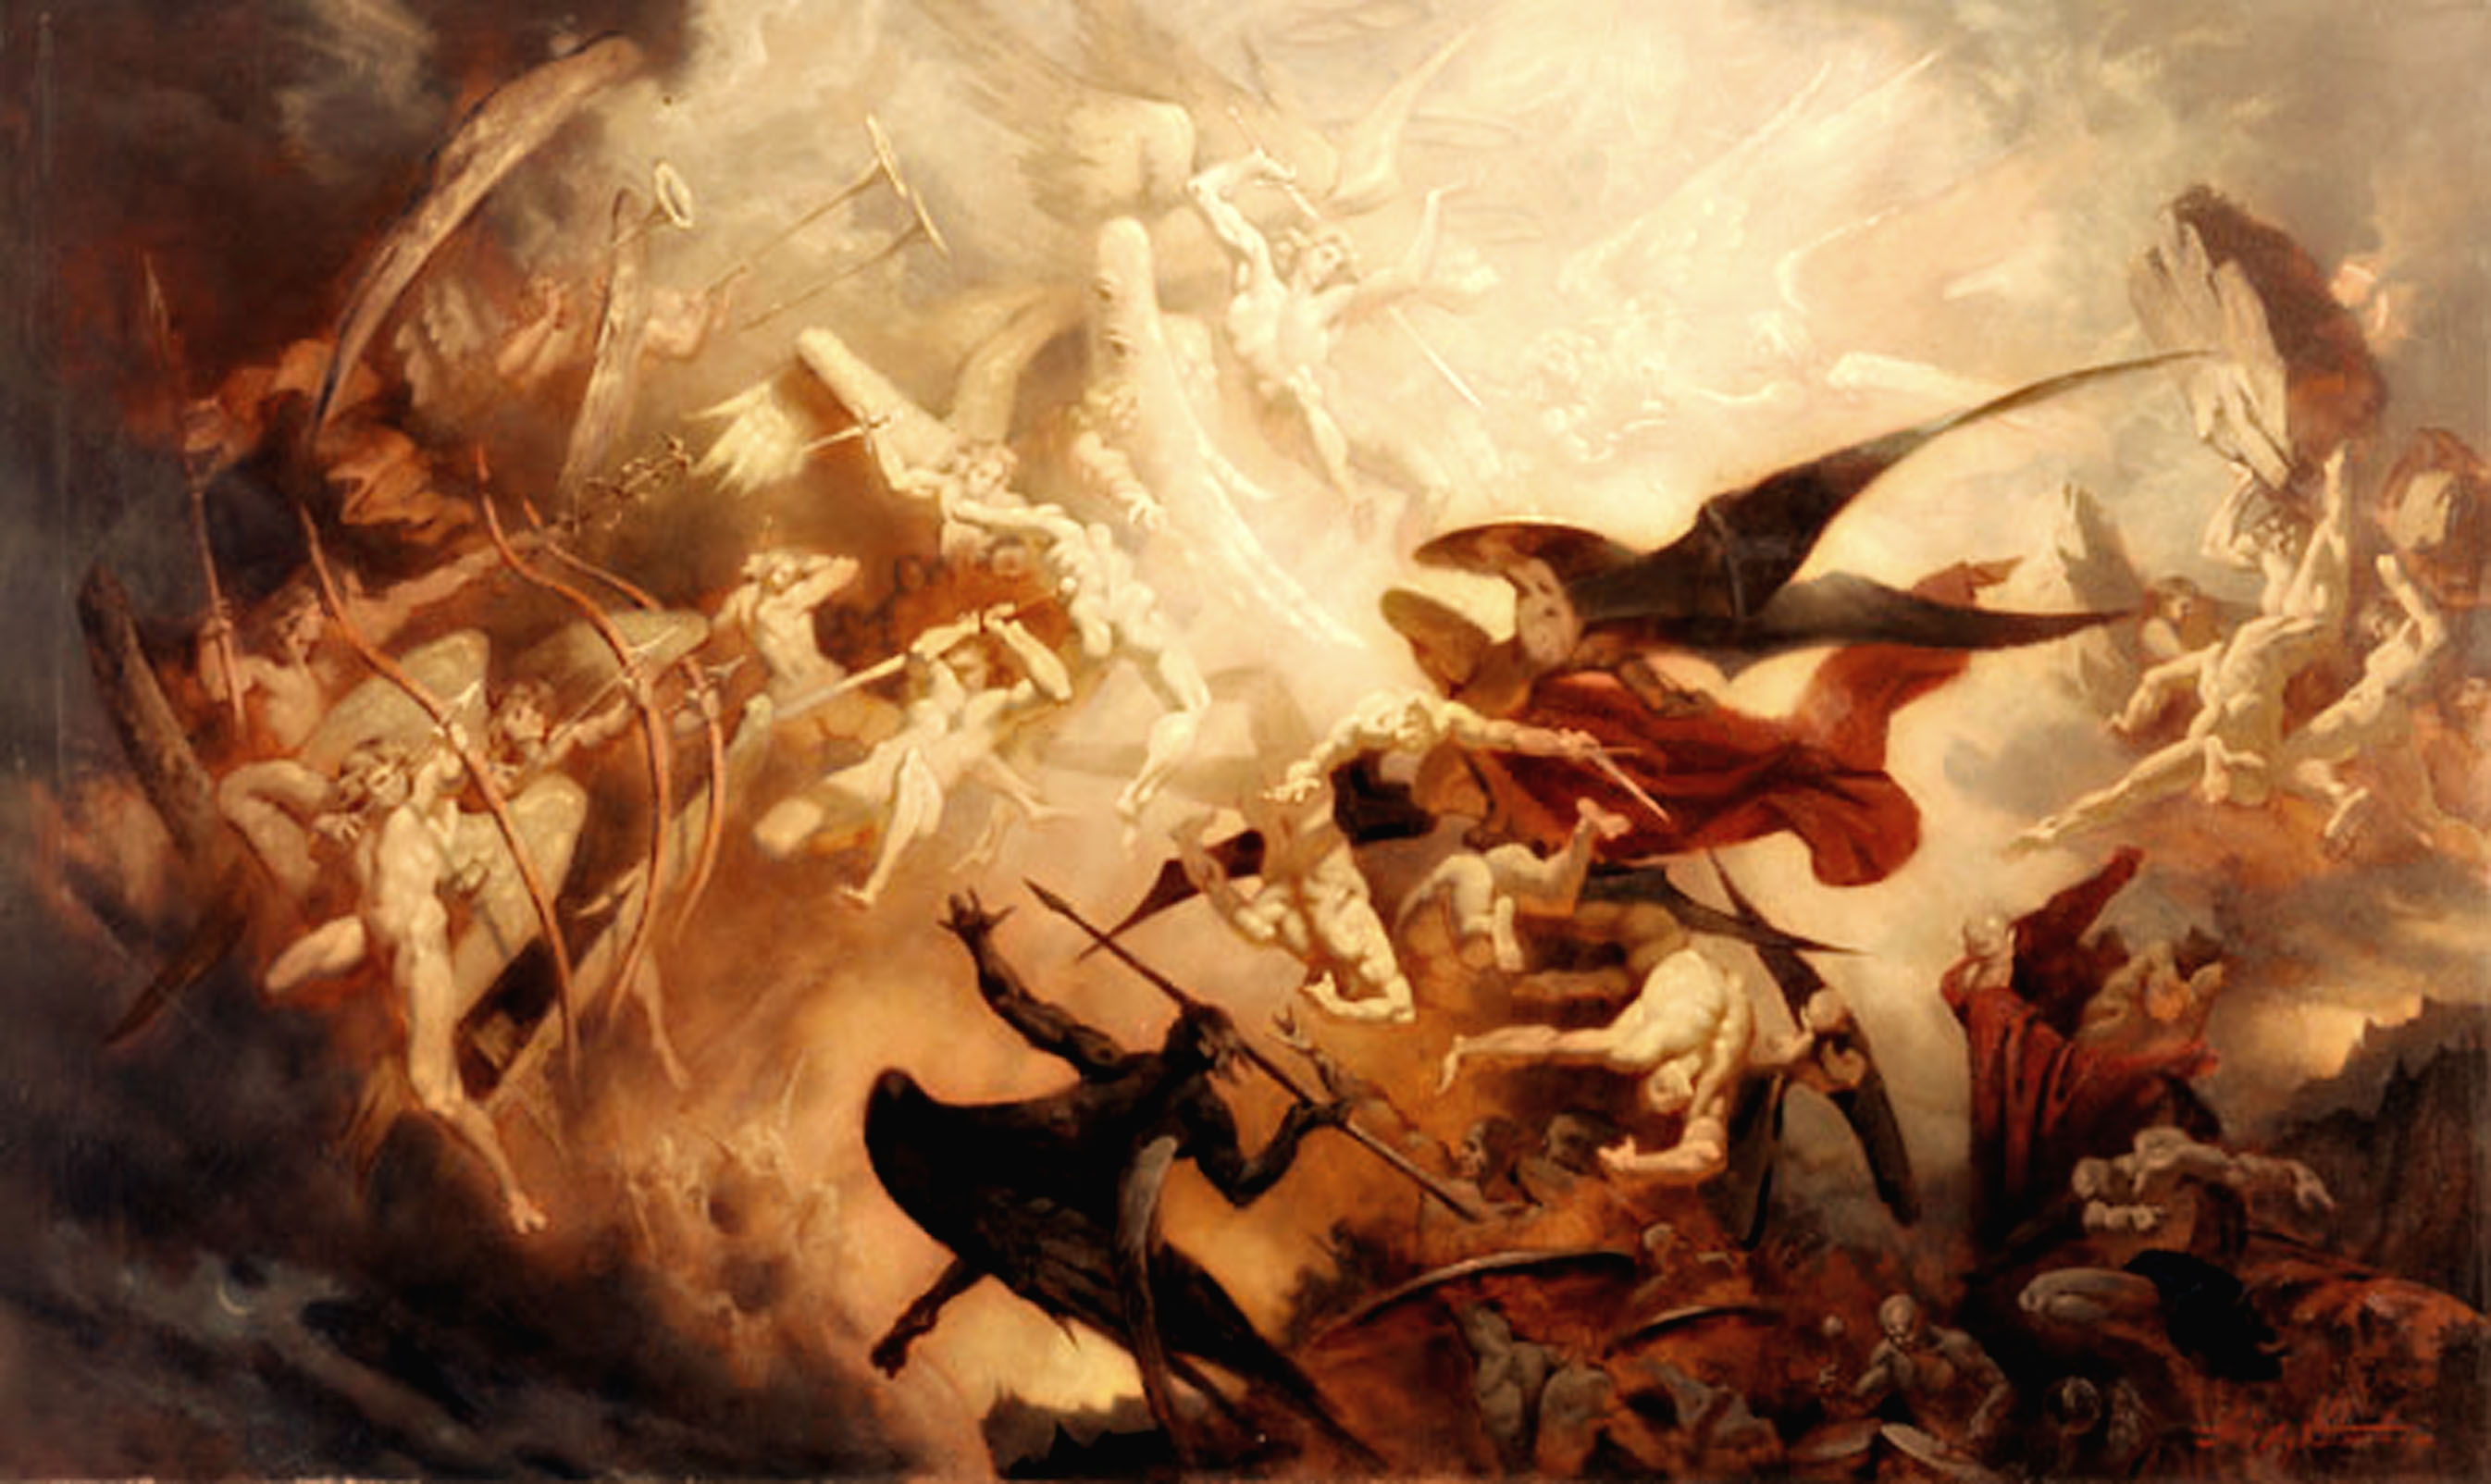 DOA UNTUK MELAWAN IBLIS – Spiritualitas Katolik